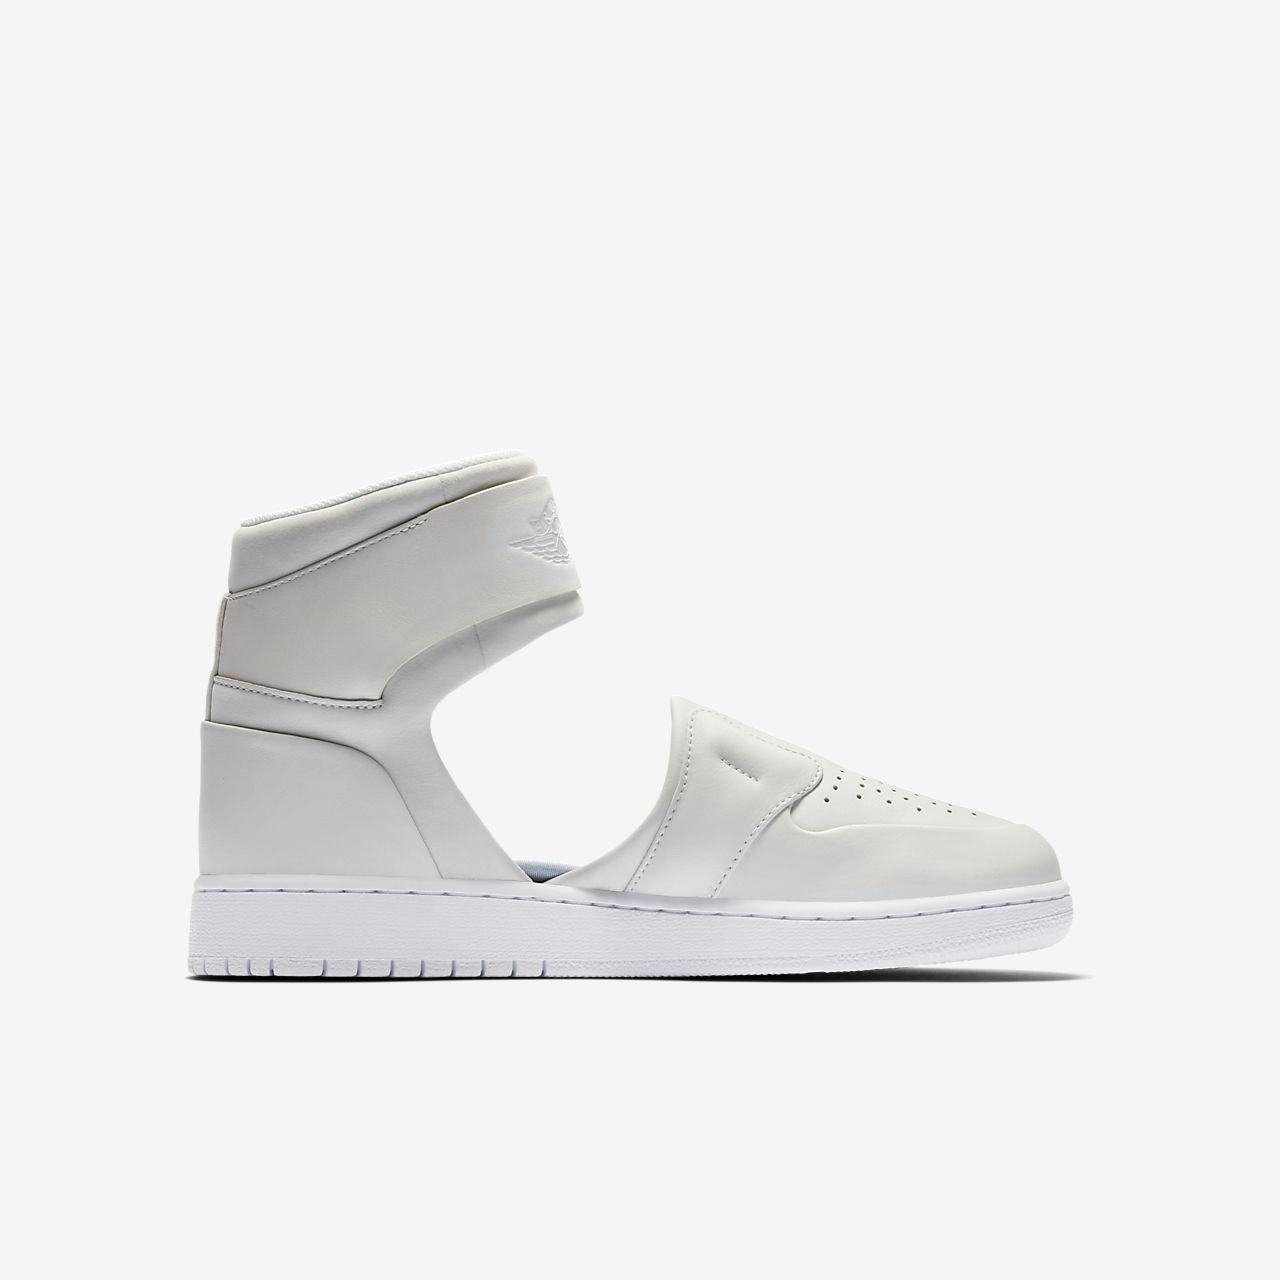 Nike Jordan AJ1 XX sneakers NRJuz8